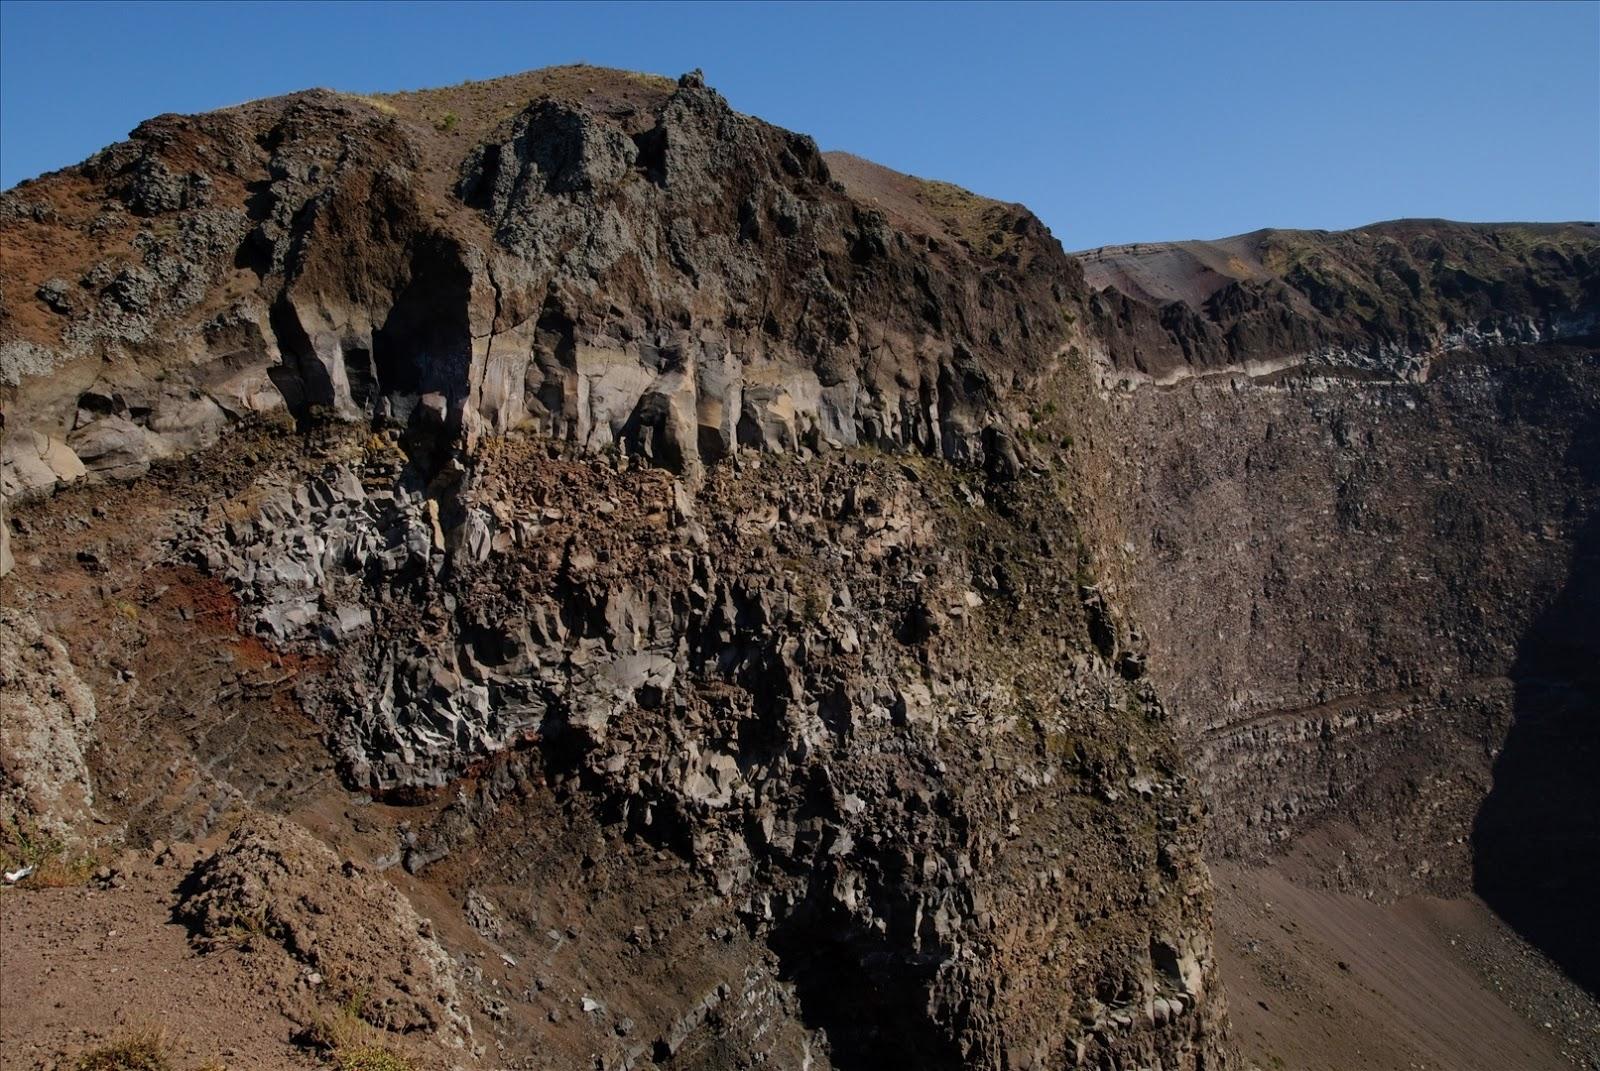 Earth's Beauty: Mount Vesuvius